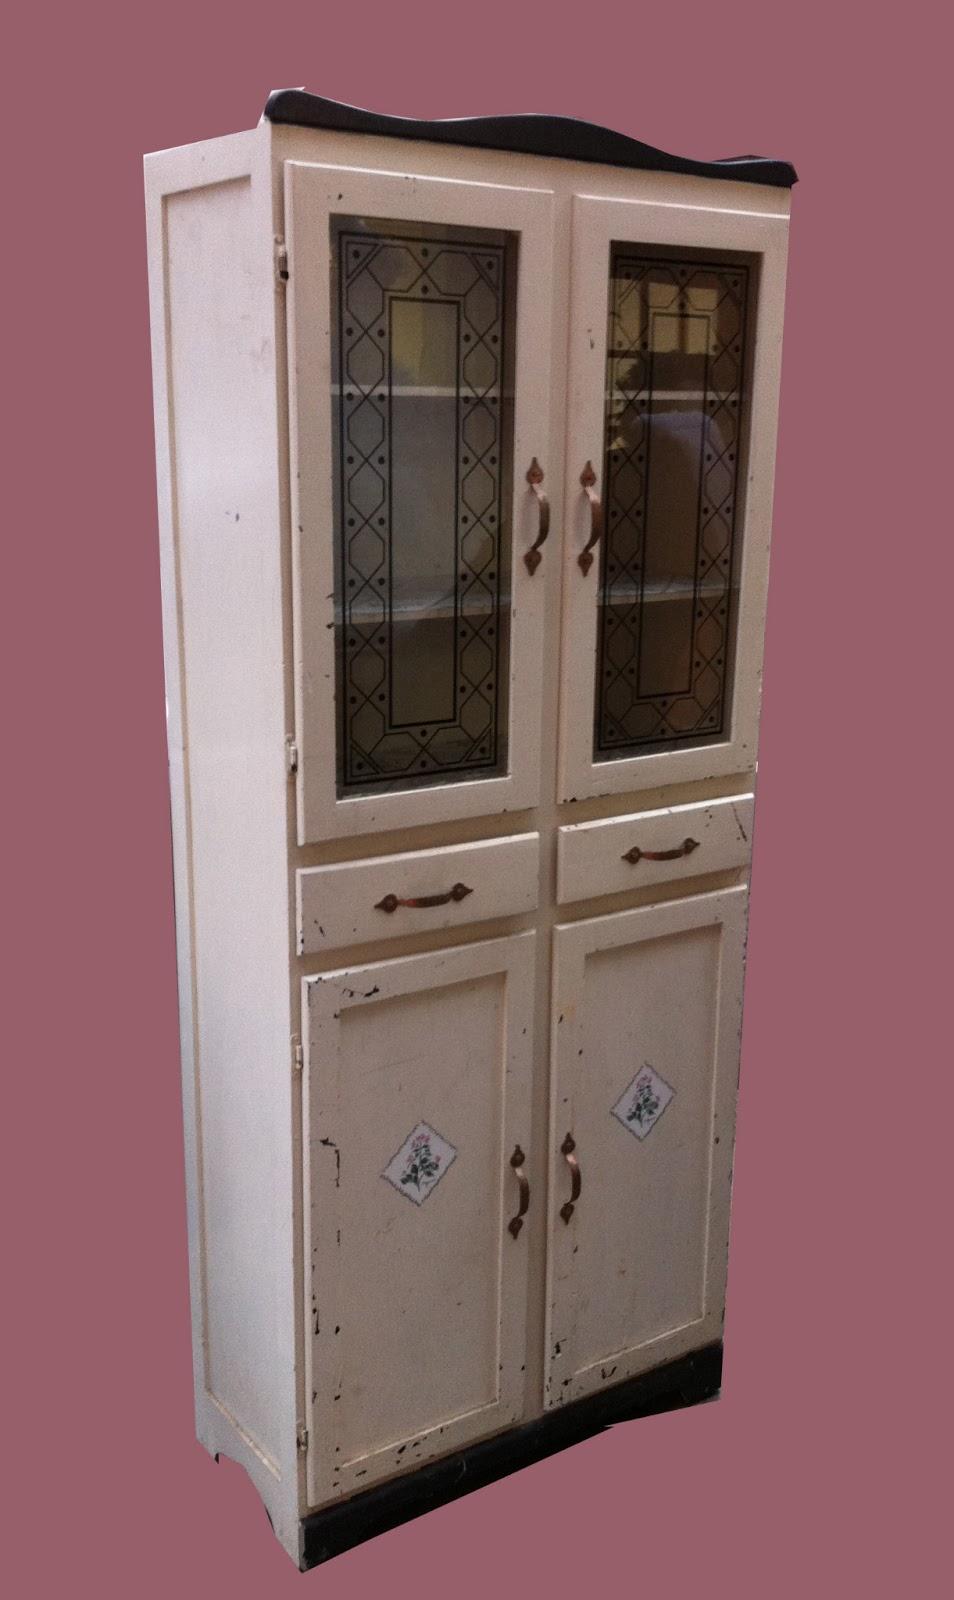 Uhuru Furniture & Collectibles: Vintage Freestanding ...